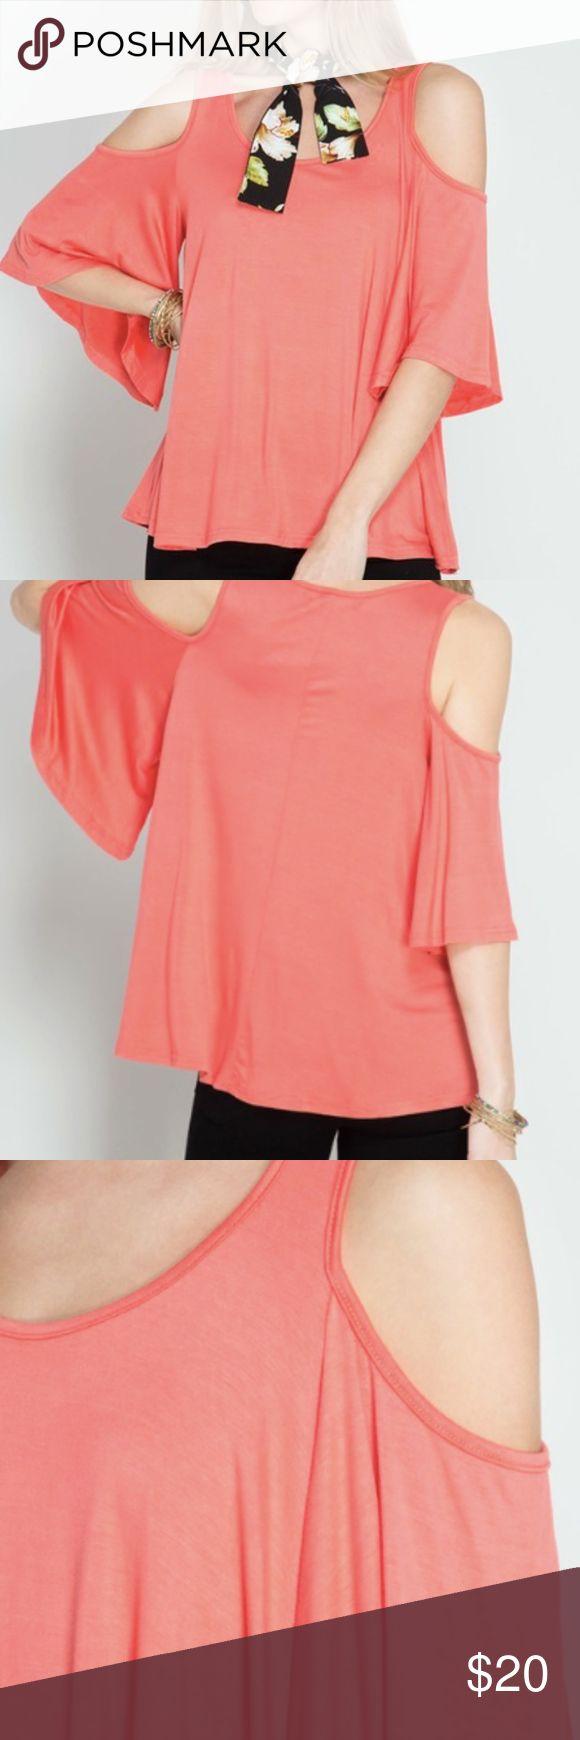 Coral Cold Shoulder Blouse Coral blouse with shoulder cut outs Tops Blouses